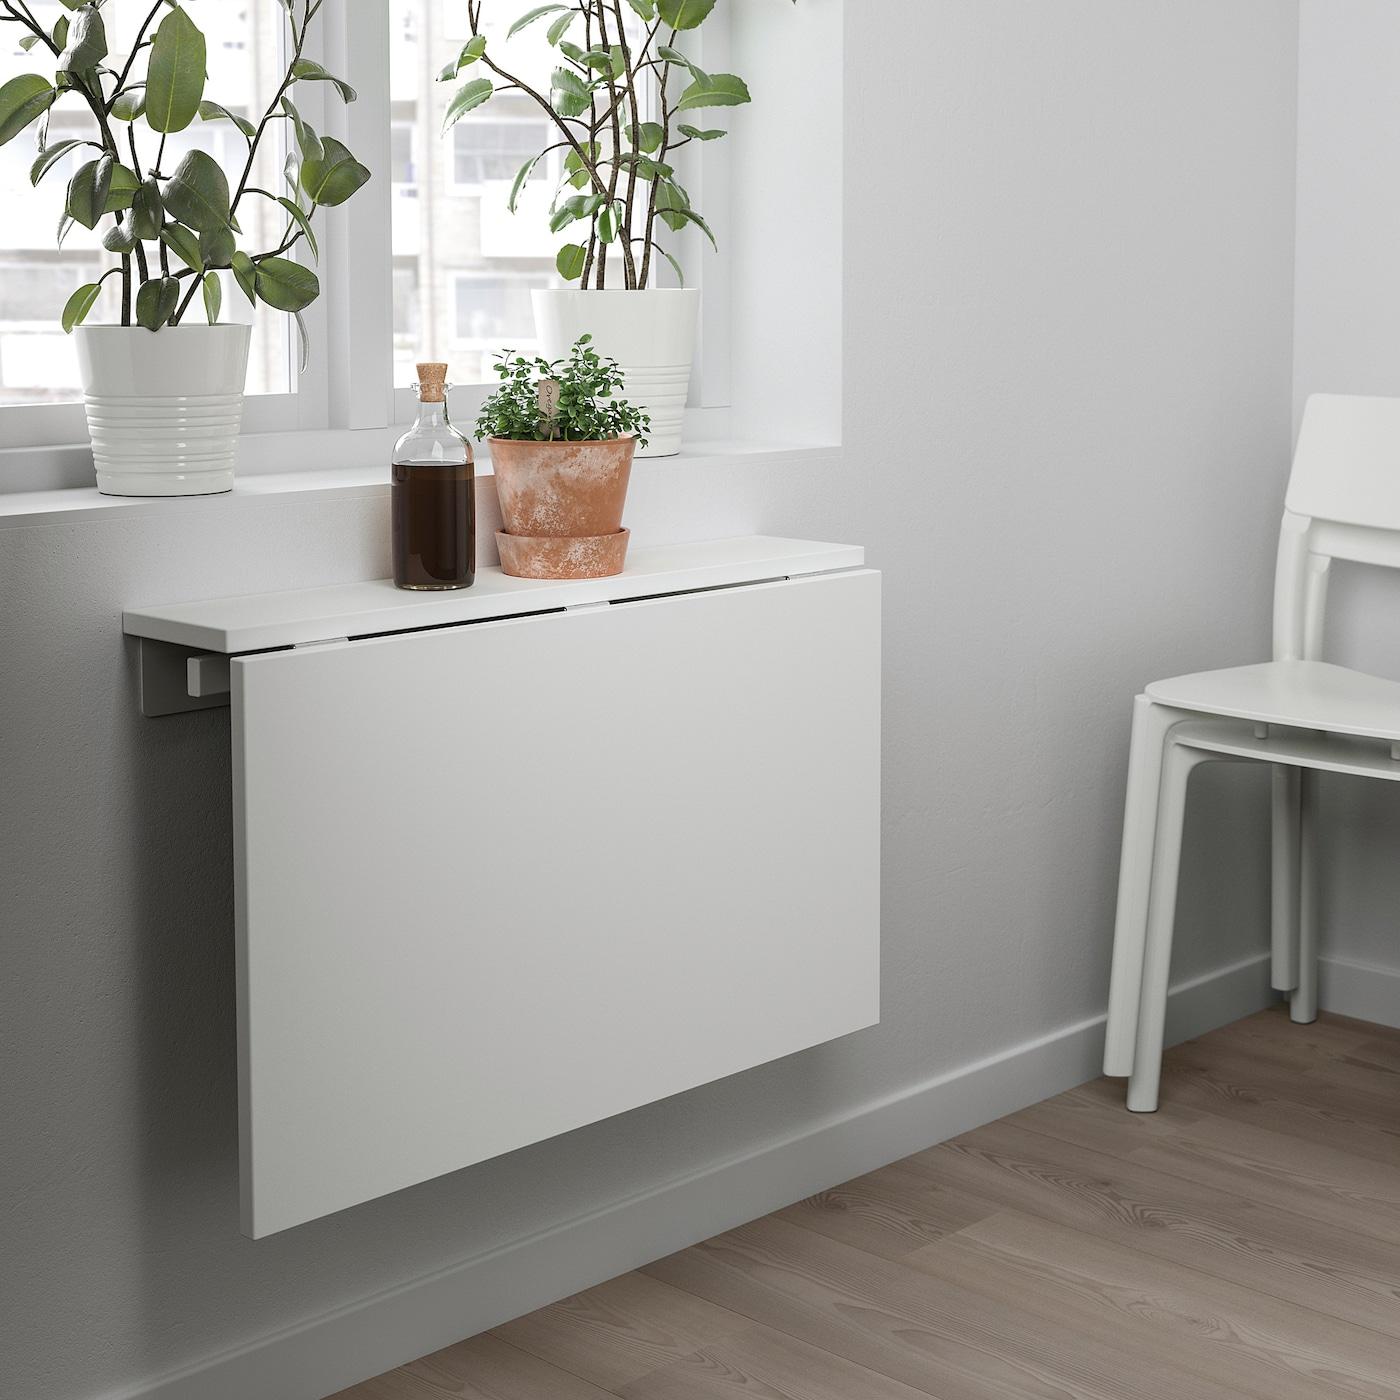 Norberg Wandklapptisch Weiss Ikea Deutschland